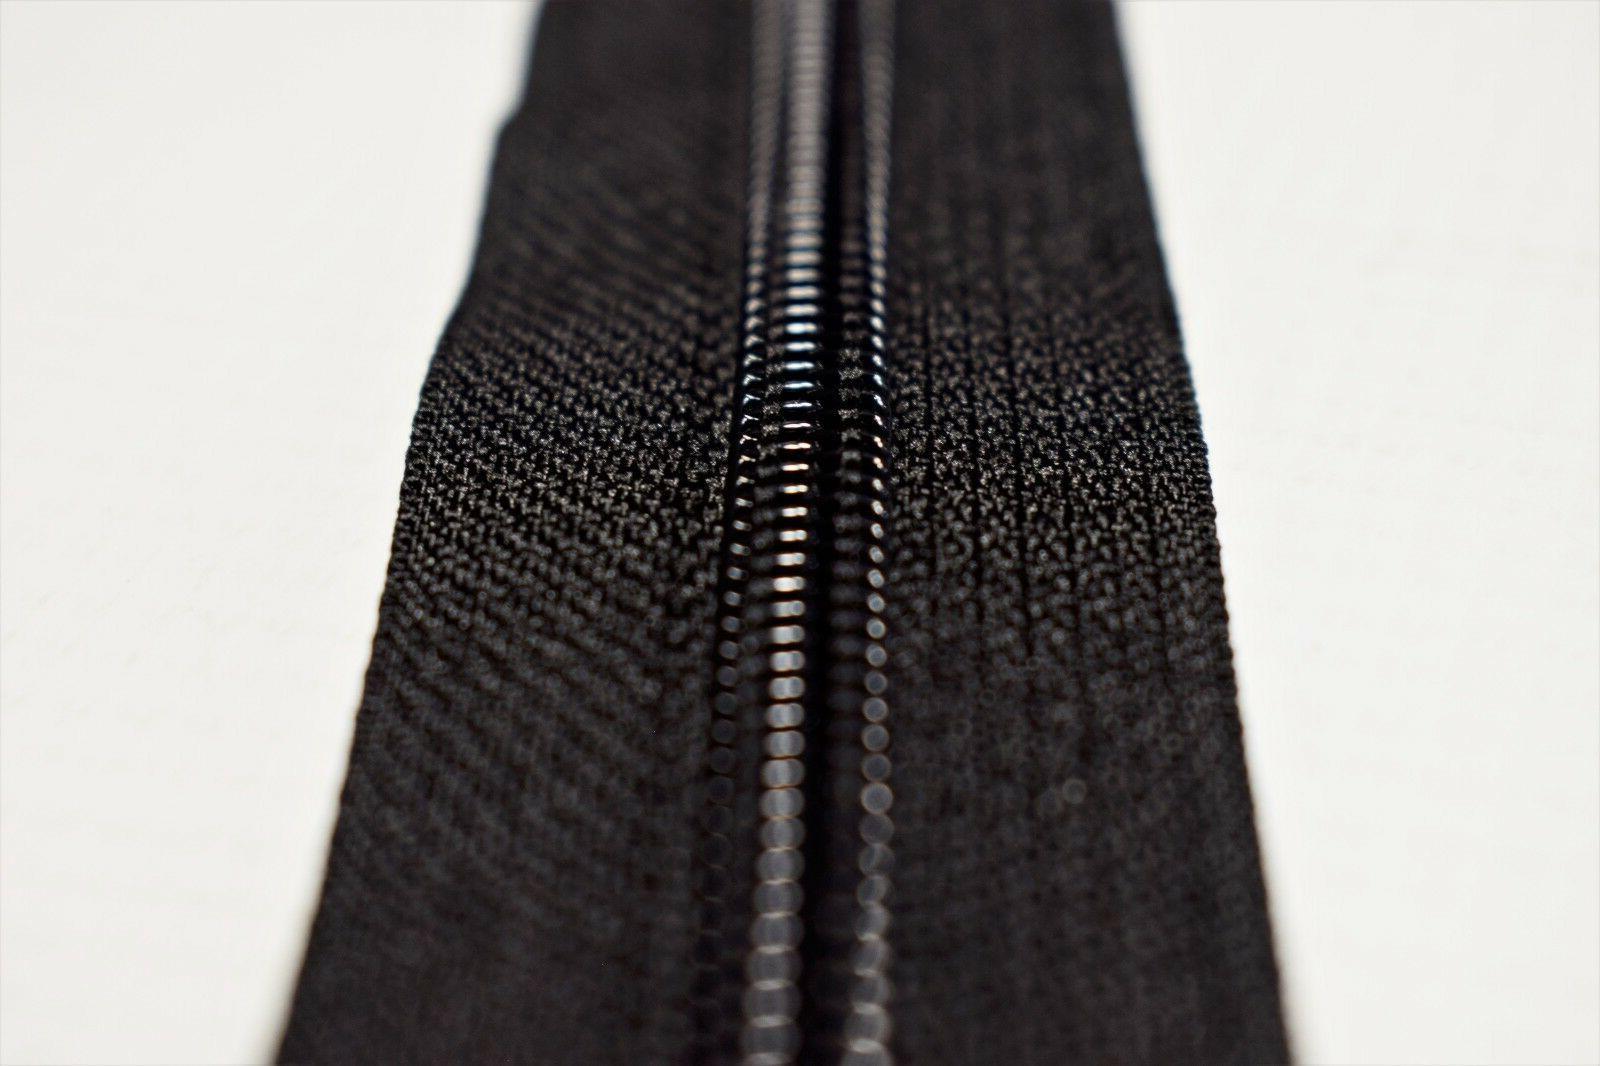 #5 Nylon Chain Cloth Apparel Heavy Duty